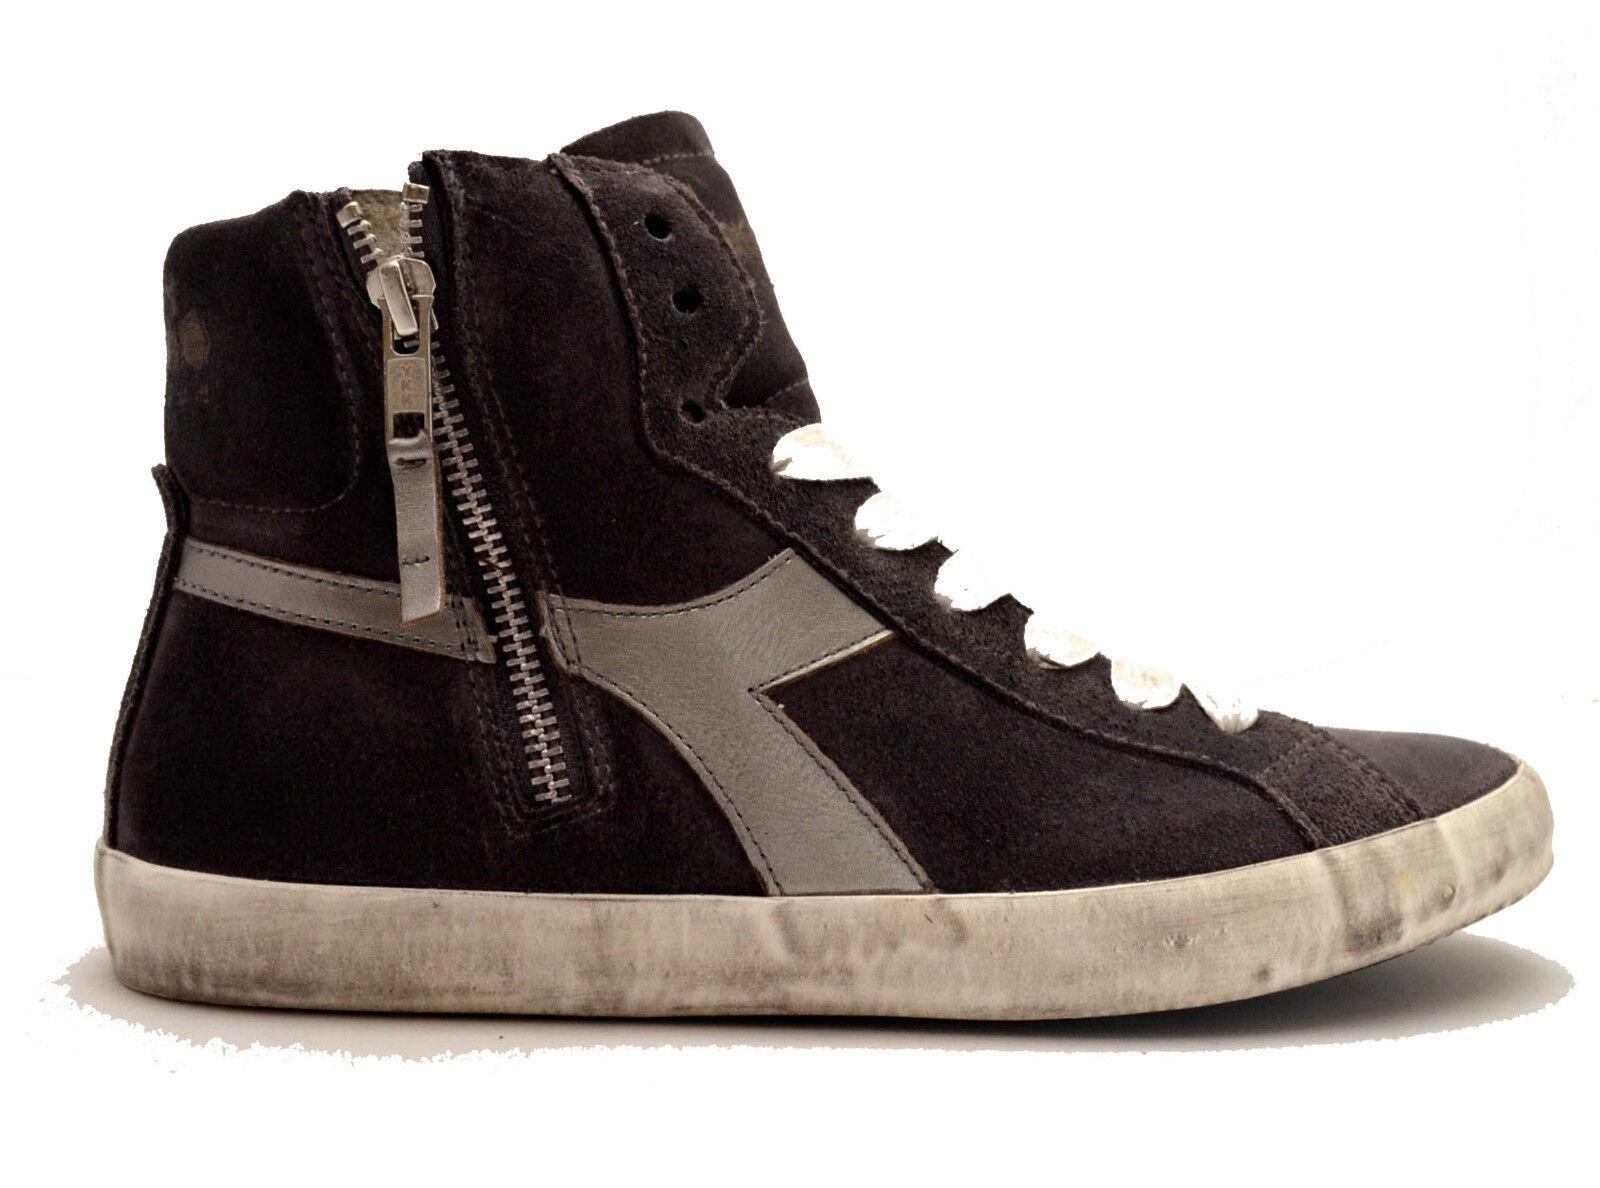 Diadora Heritage scarpe scarpe da ginnastica Pelle Vintage shoes Uomo Uomo Donna Donna 159097